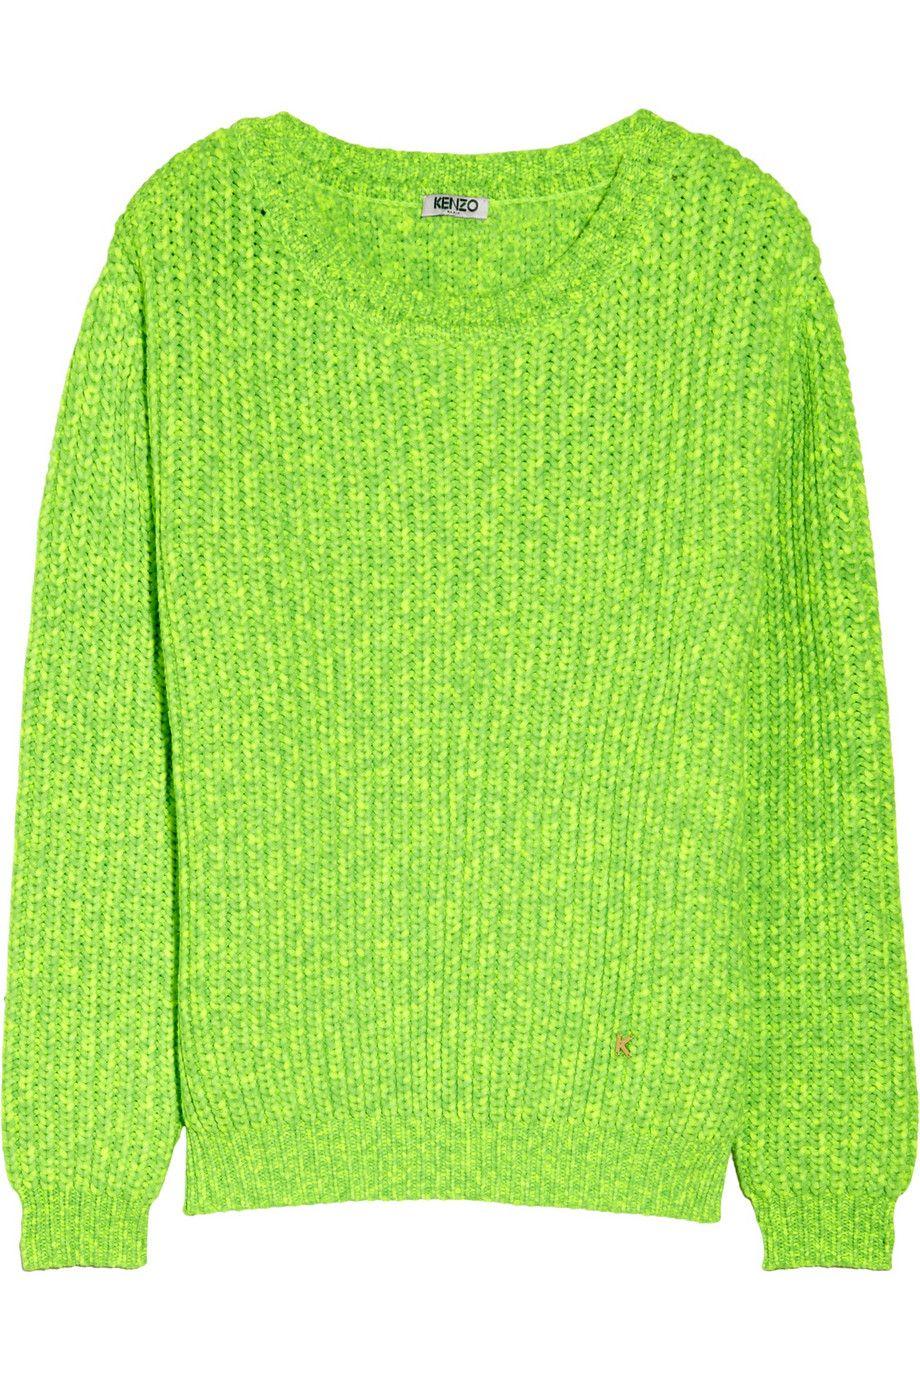 306cf271 KENZO | Neon chunky-knit sweater | NET-A-PORTER.COM | Trend: Bright ...